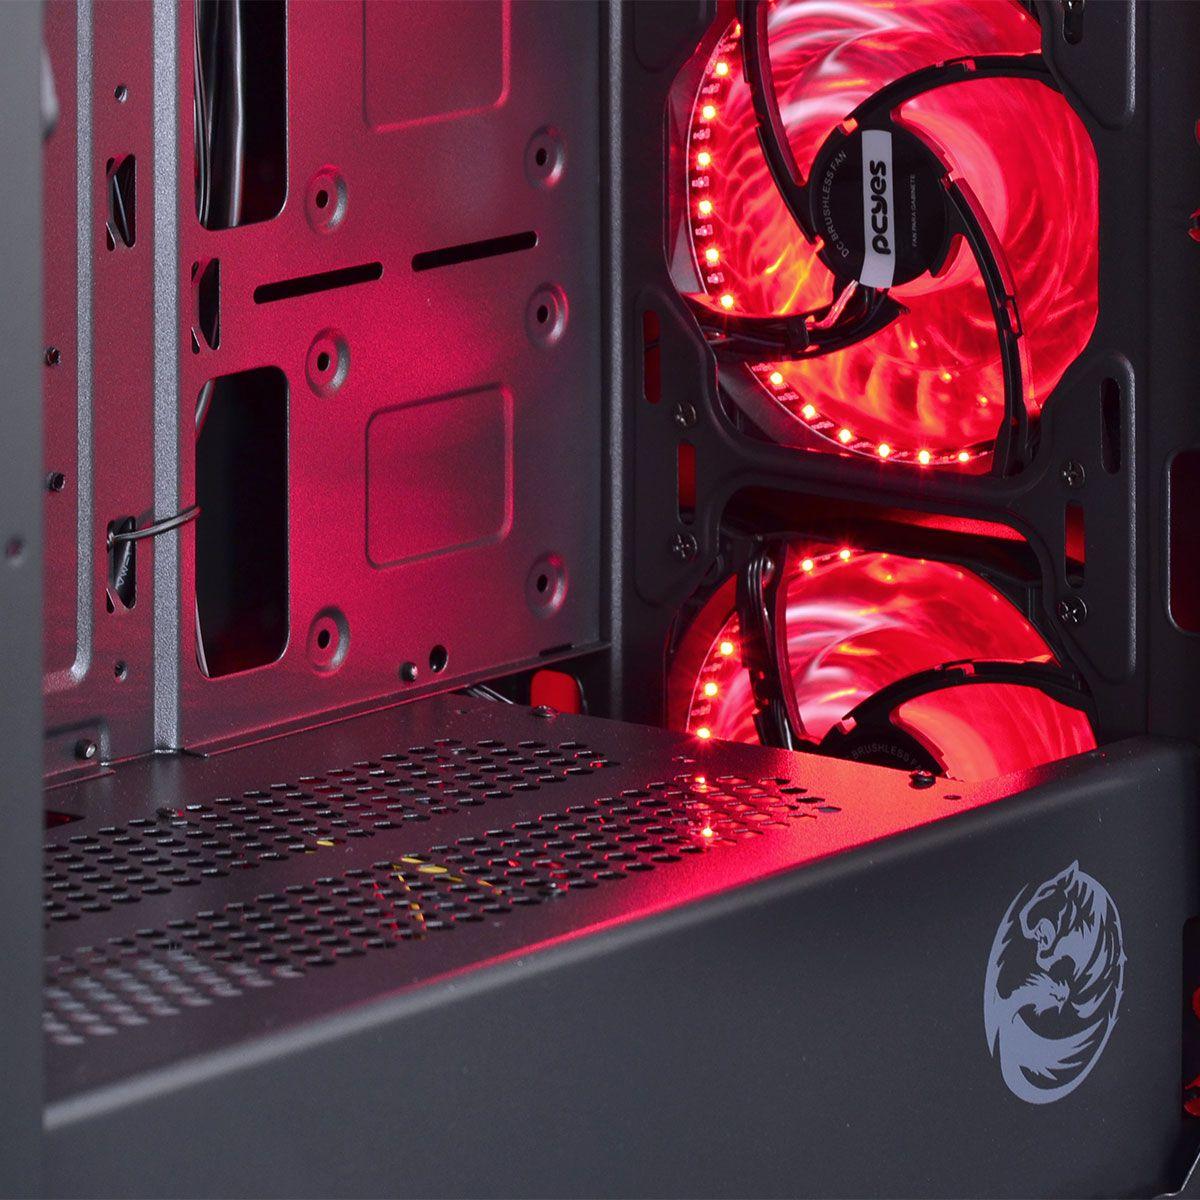 Gabinete ATX Tank Vermelho/Preto com LED Vermelho e Topo Vidro Temperado e Lateral em Acrílico TANPVVM3FCVT - Pcyes